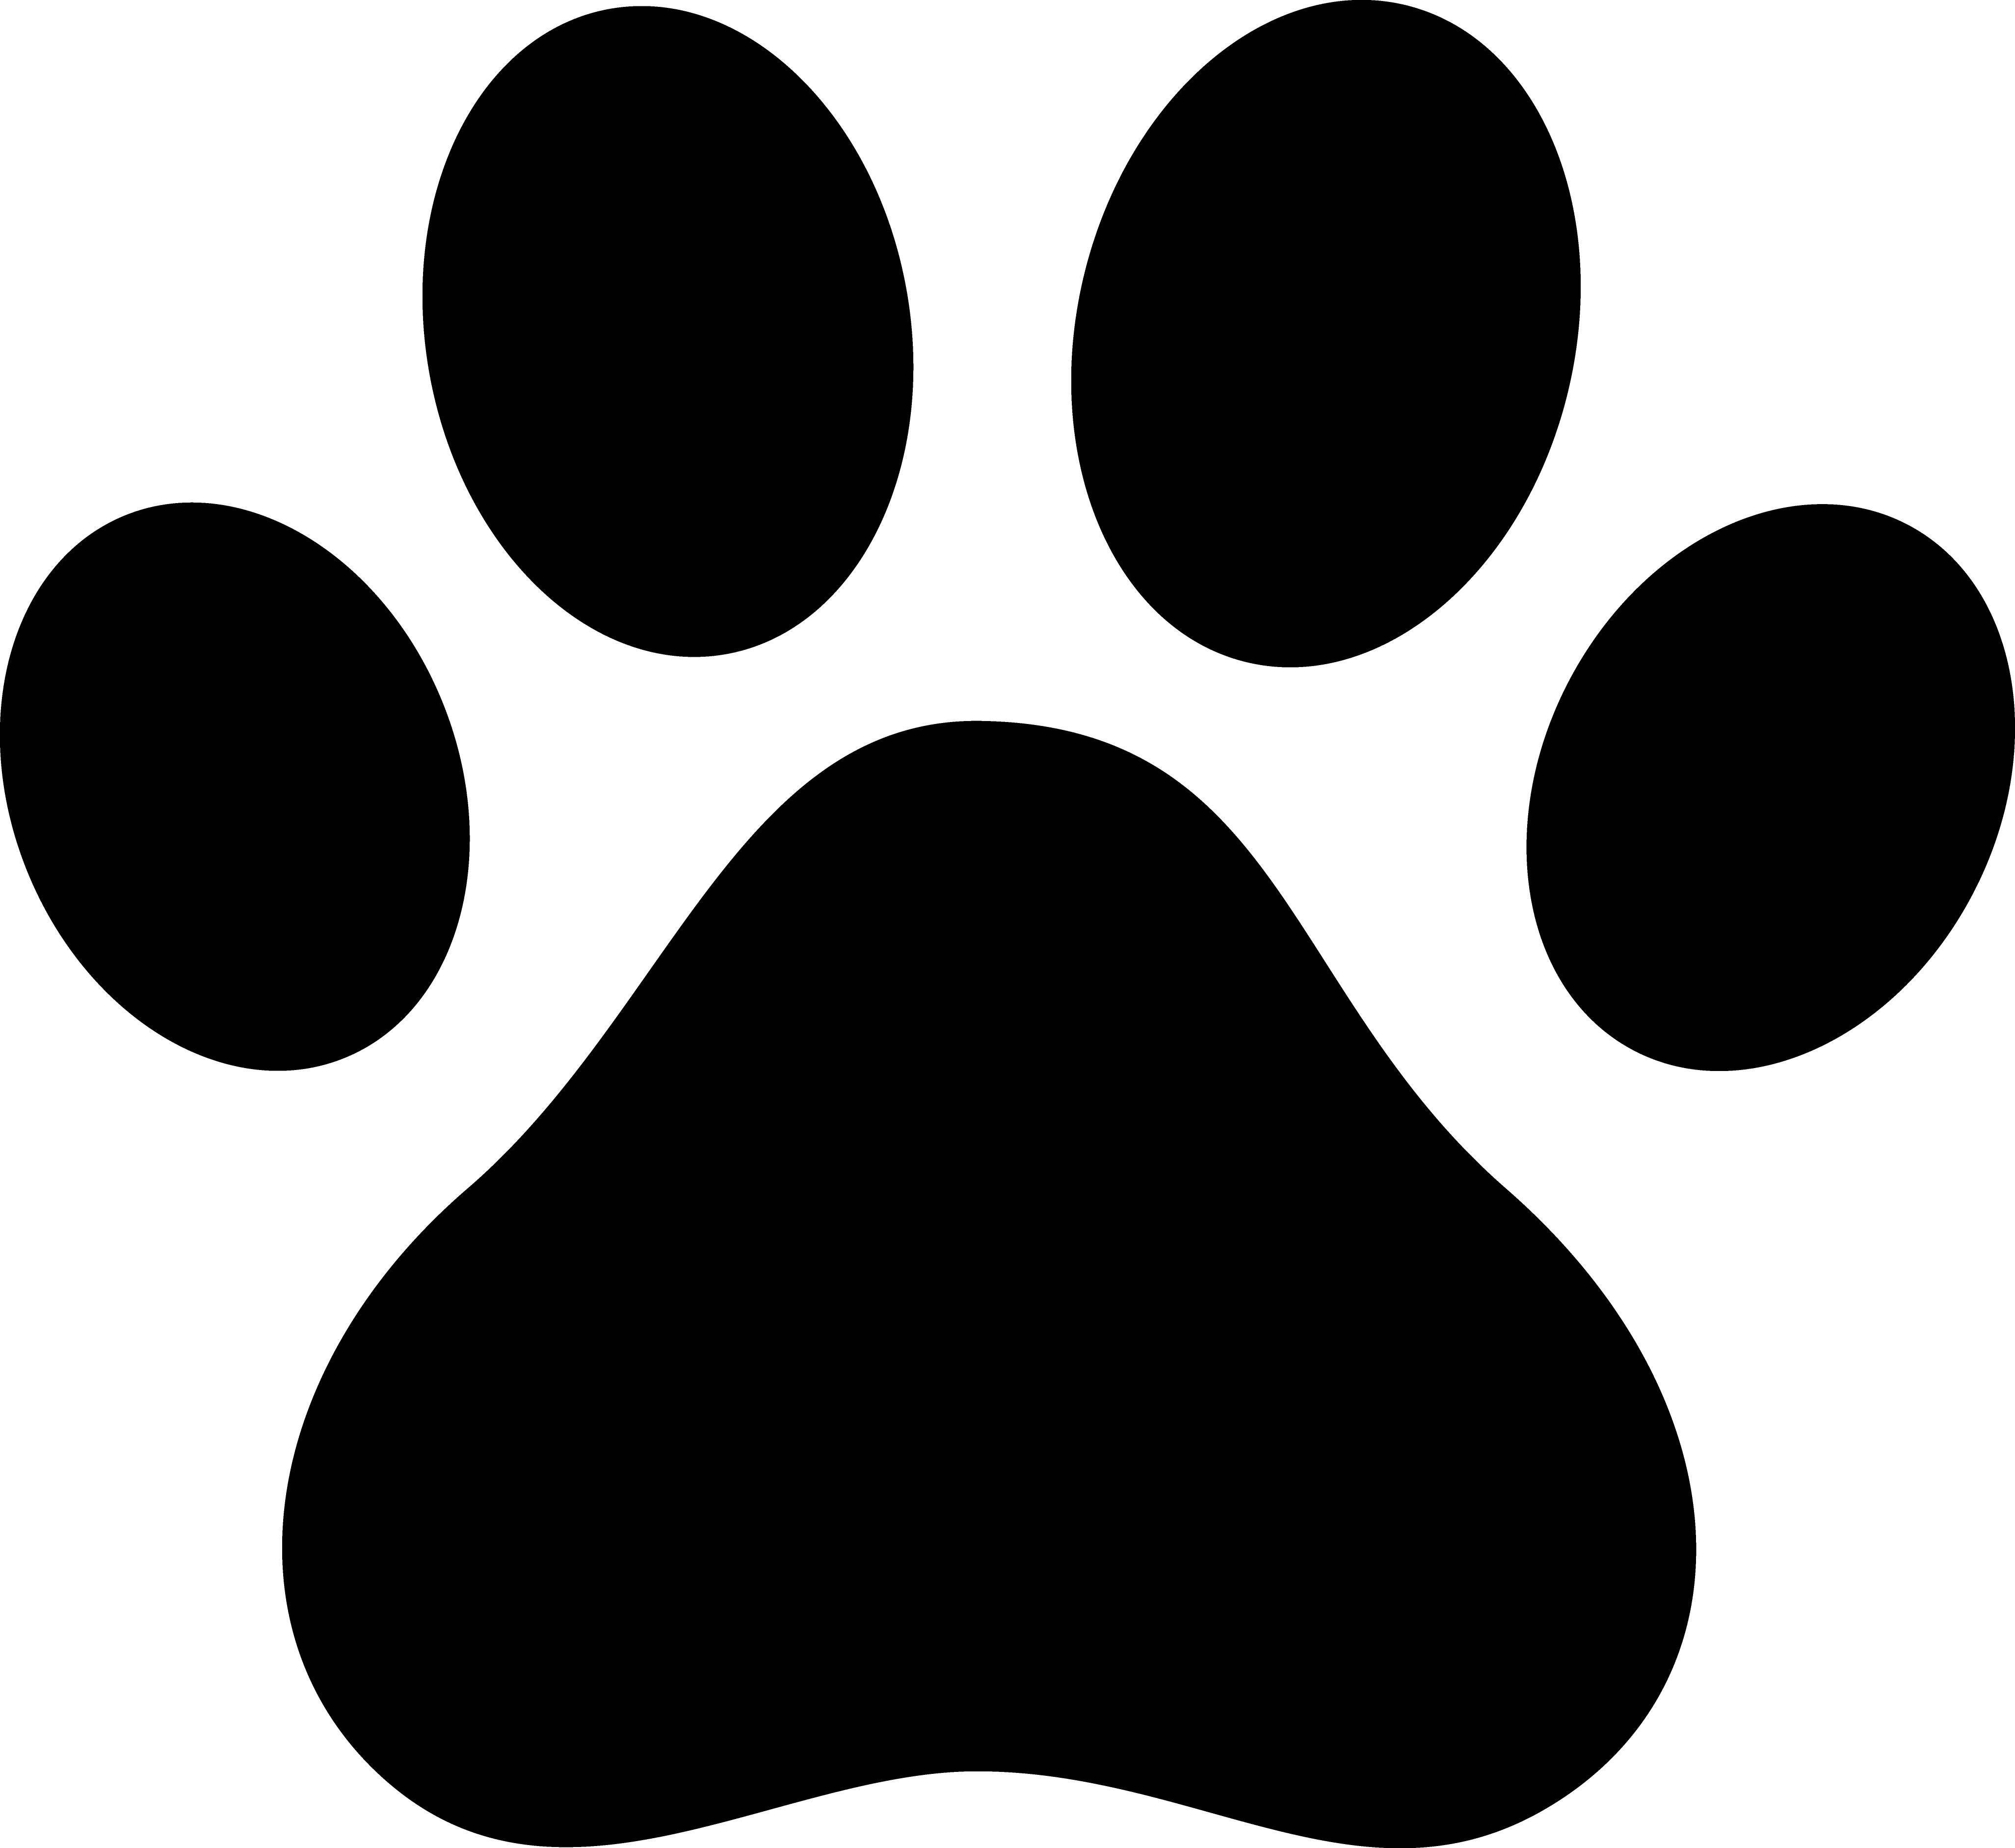 Paw PNG HD - 145699